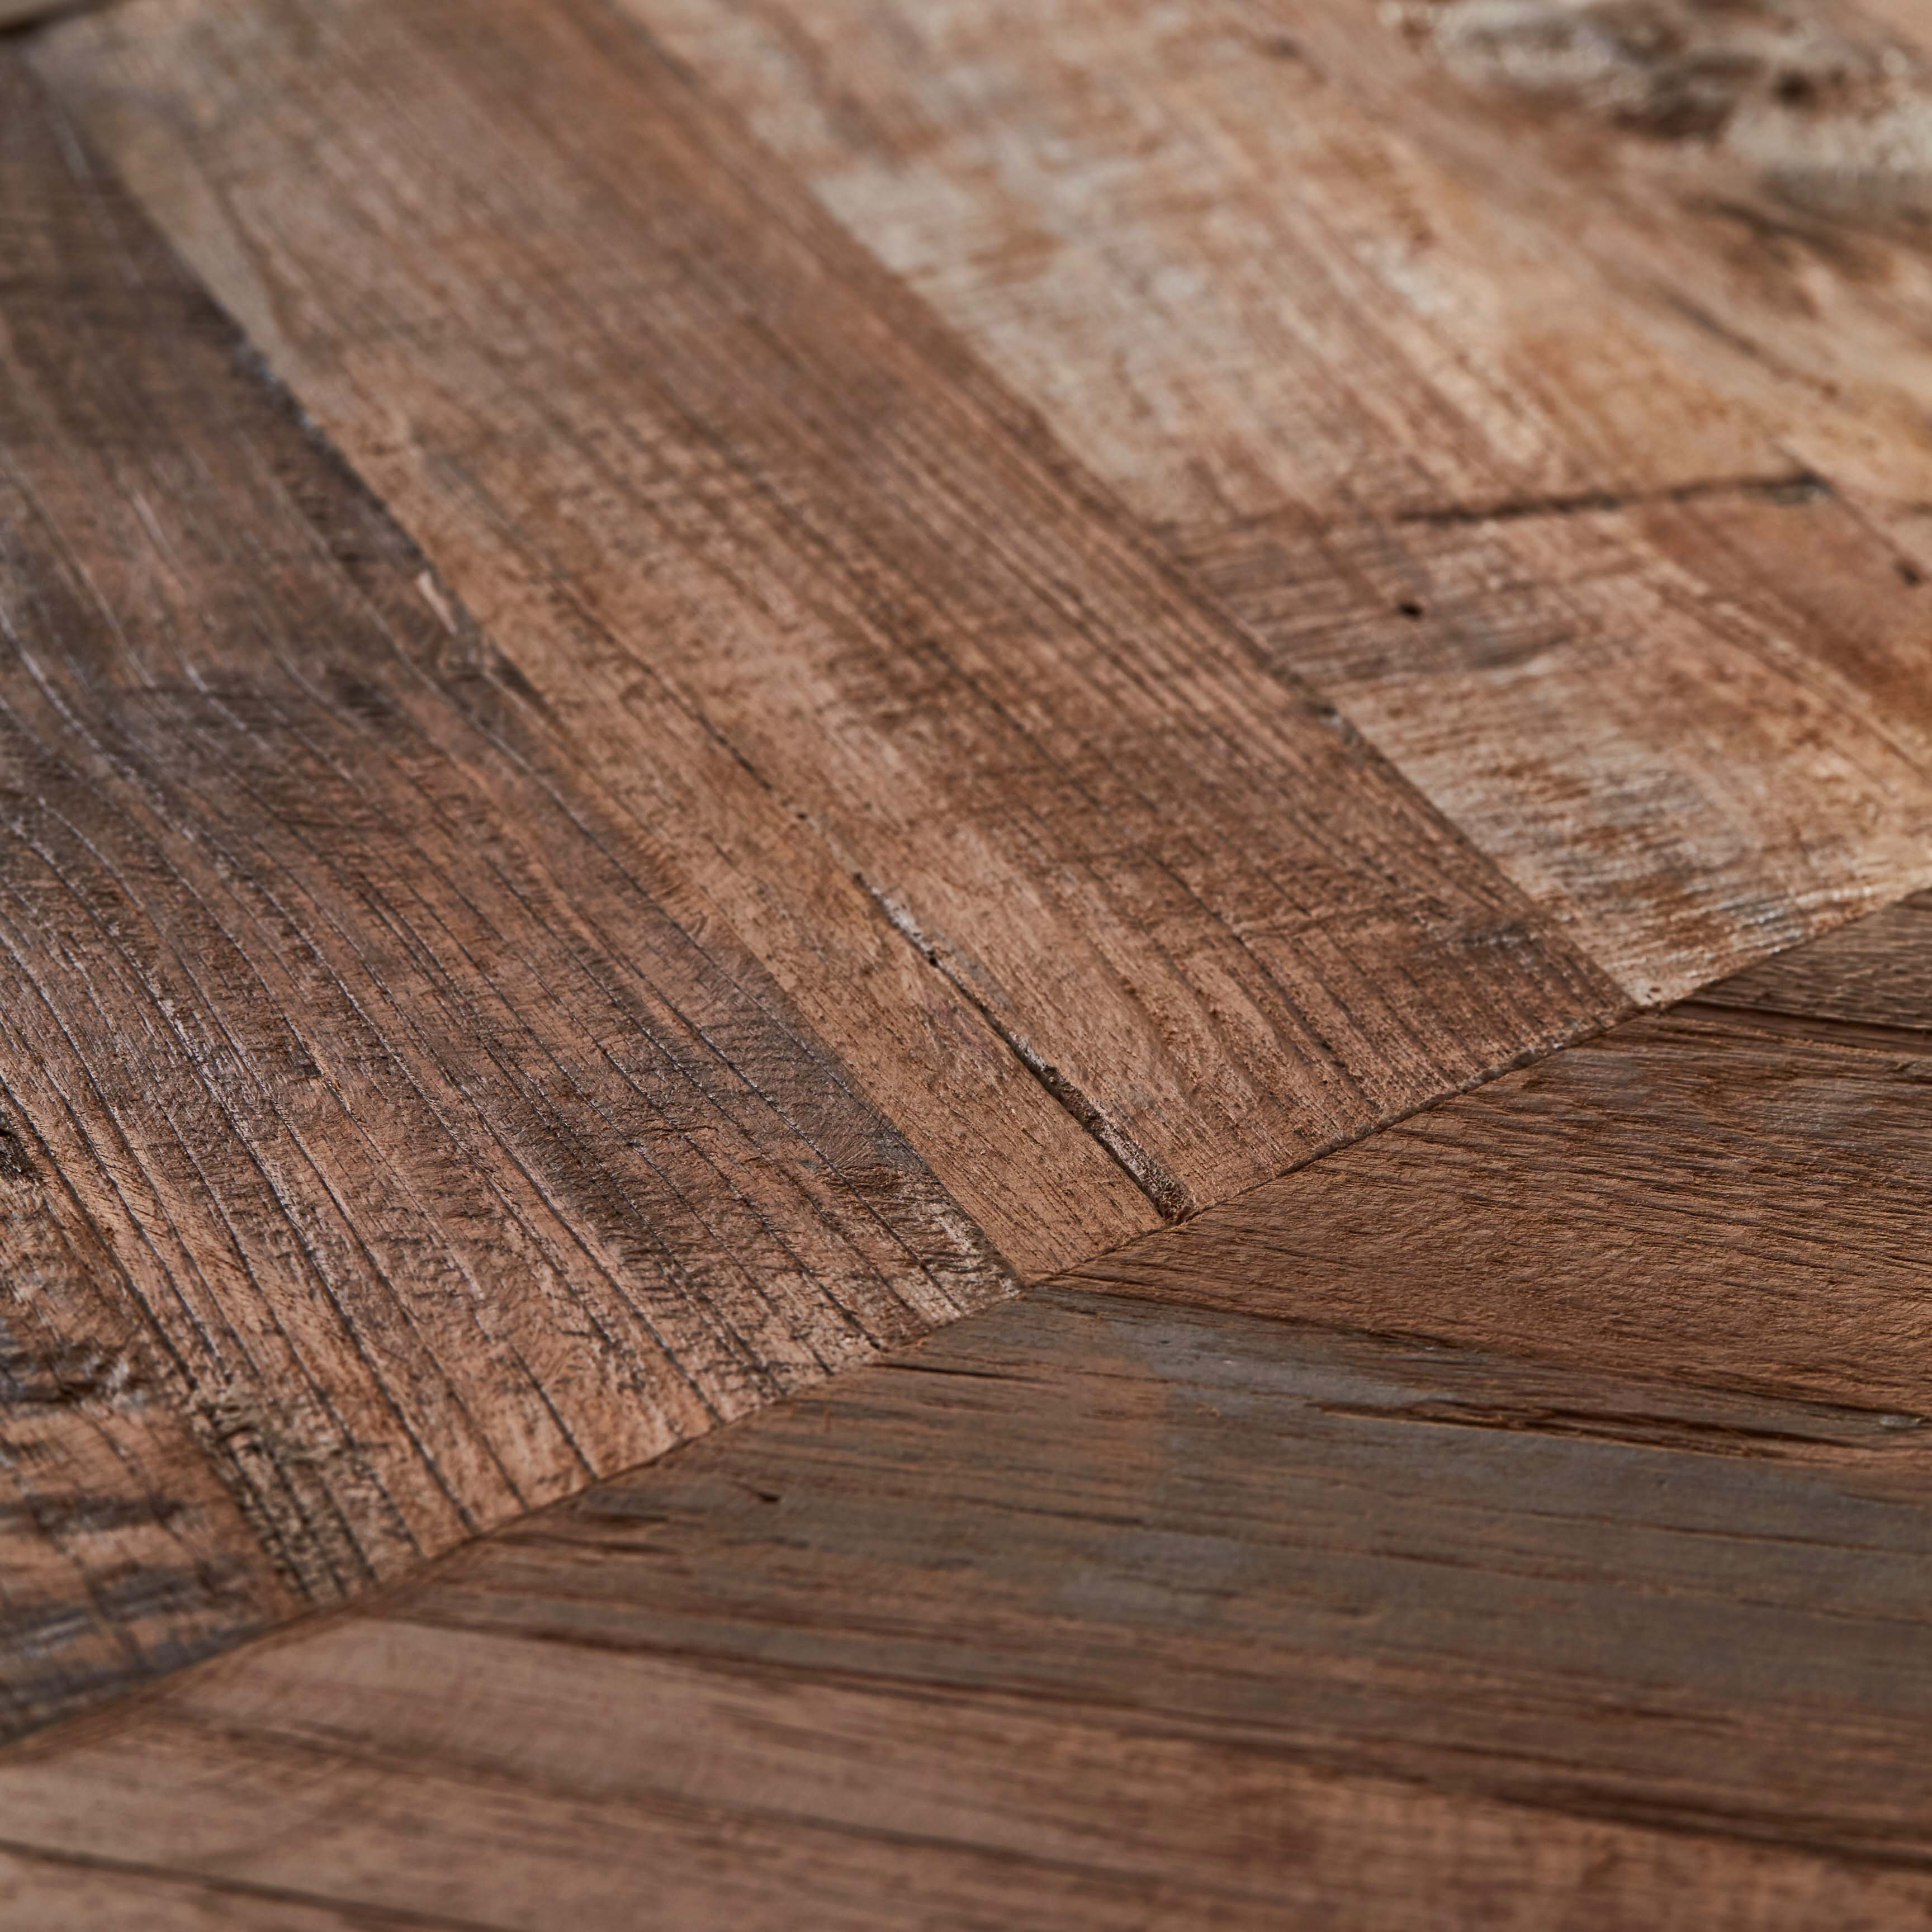 chevron patina closeup - Reclaimed Teak Plywood Panels